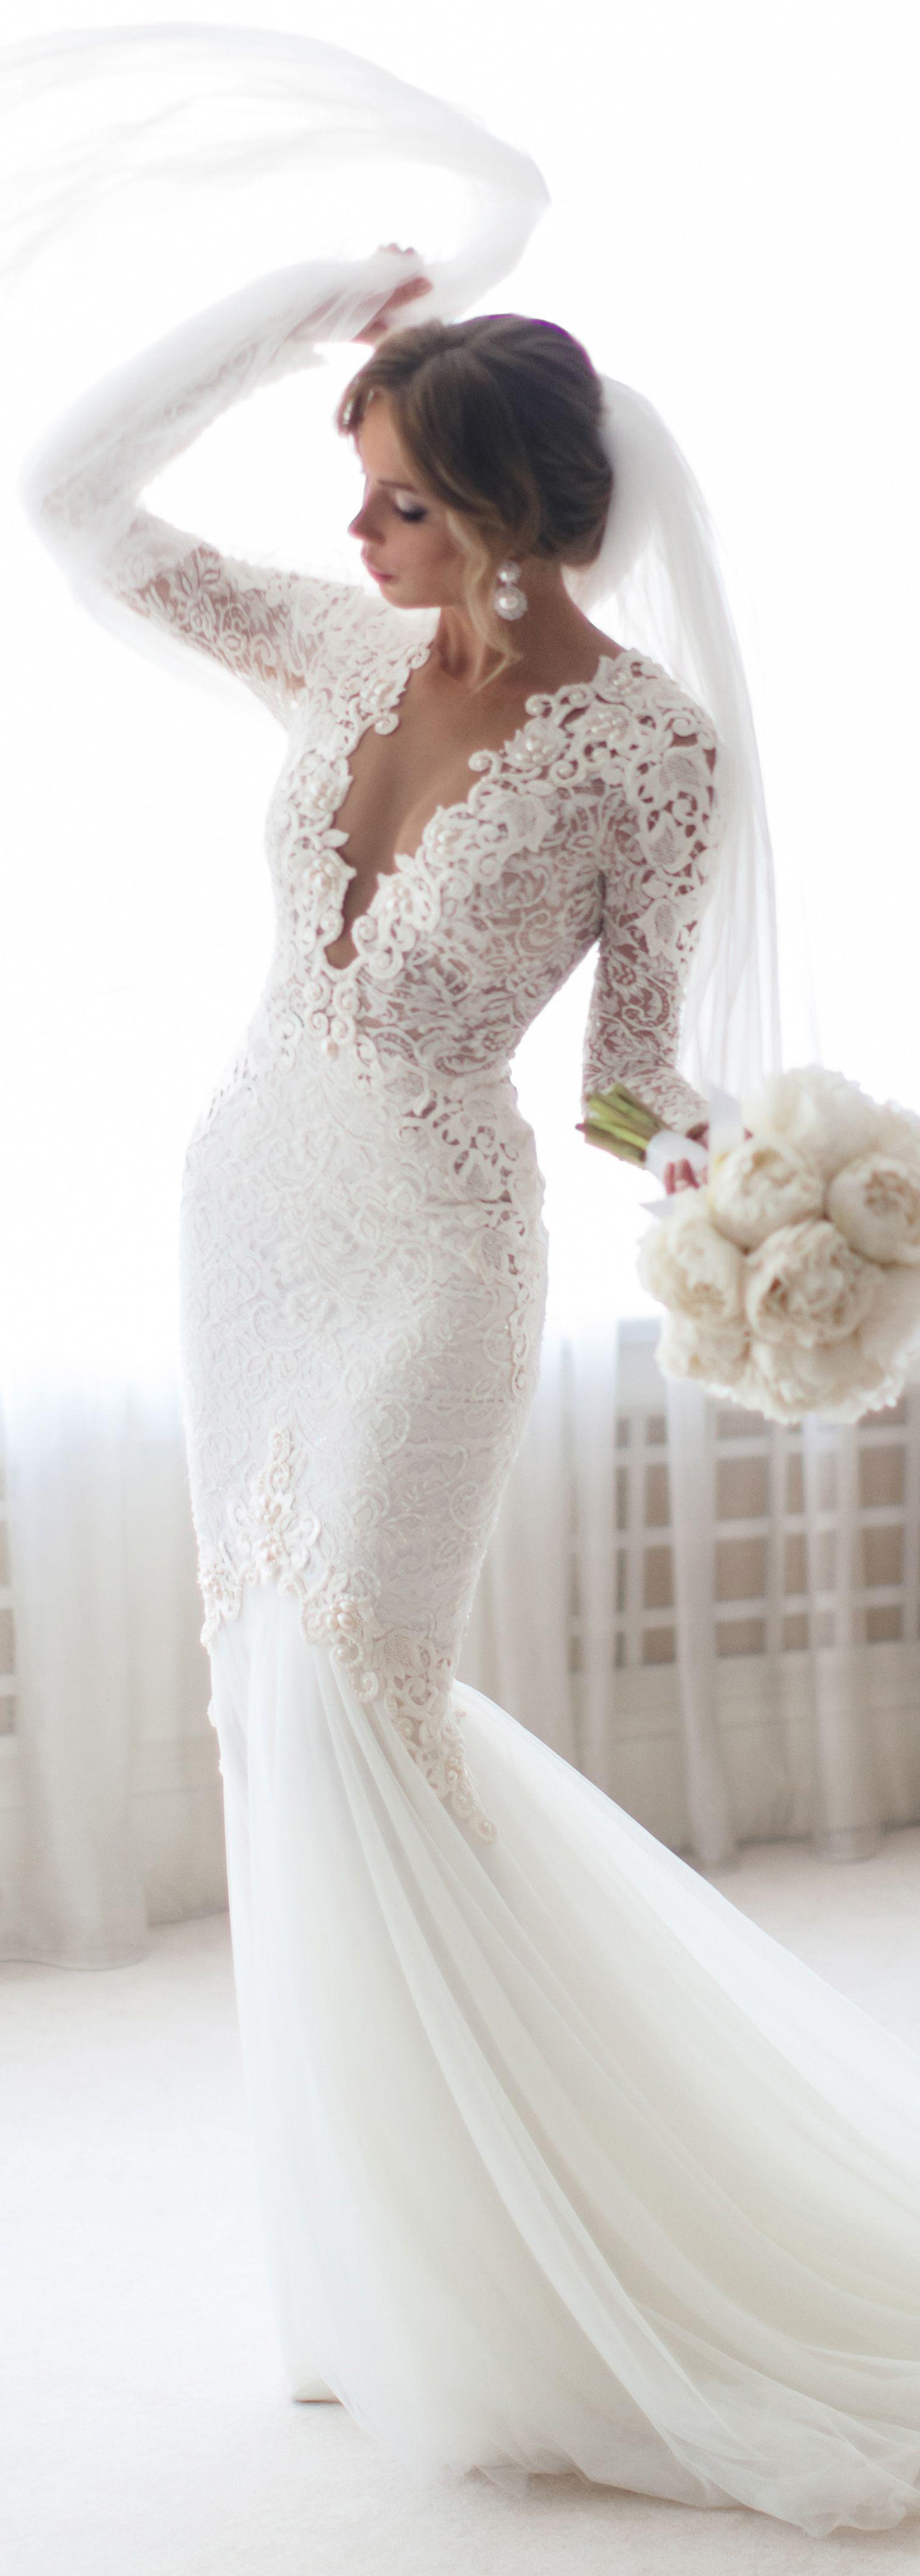 Pin by liz buhn on dresses pinterest modern classic lace